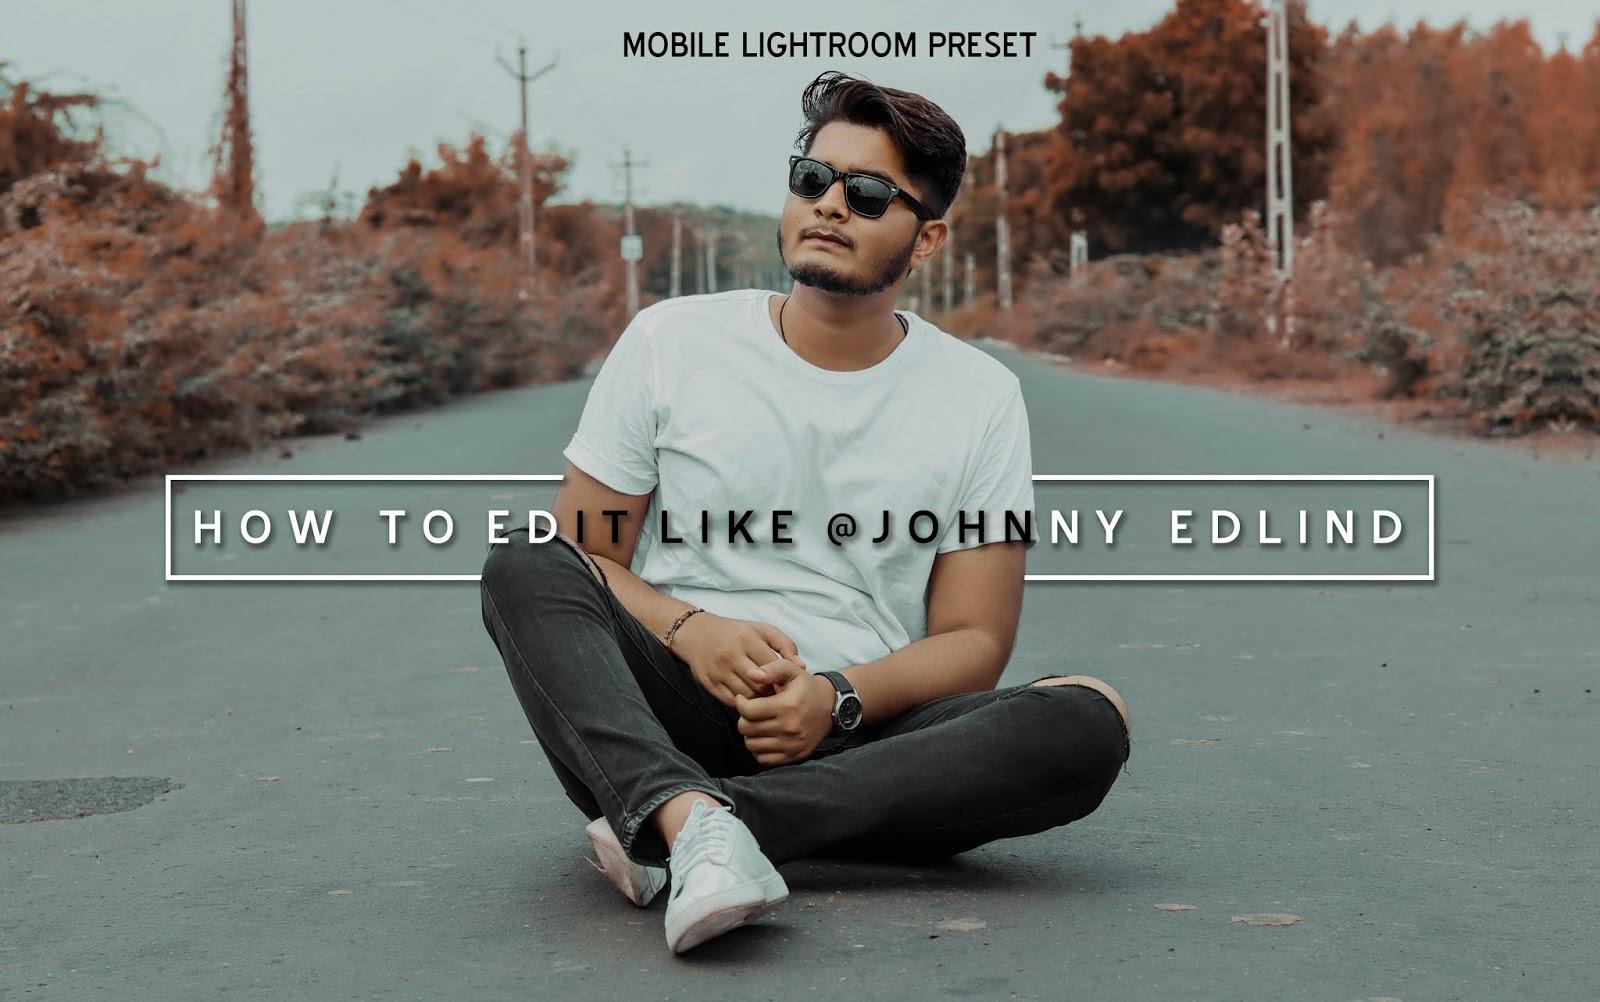 Download Johnny Edlind Inspired Mobile Lightroom Presets for Free | How to Edit Photos Like @johnnyedlind in Mobile Lightroom